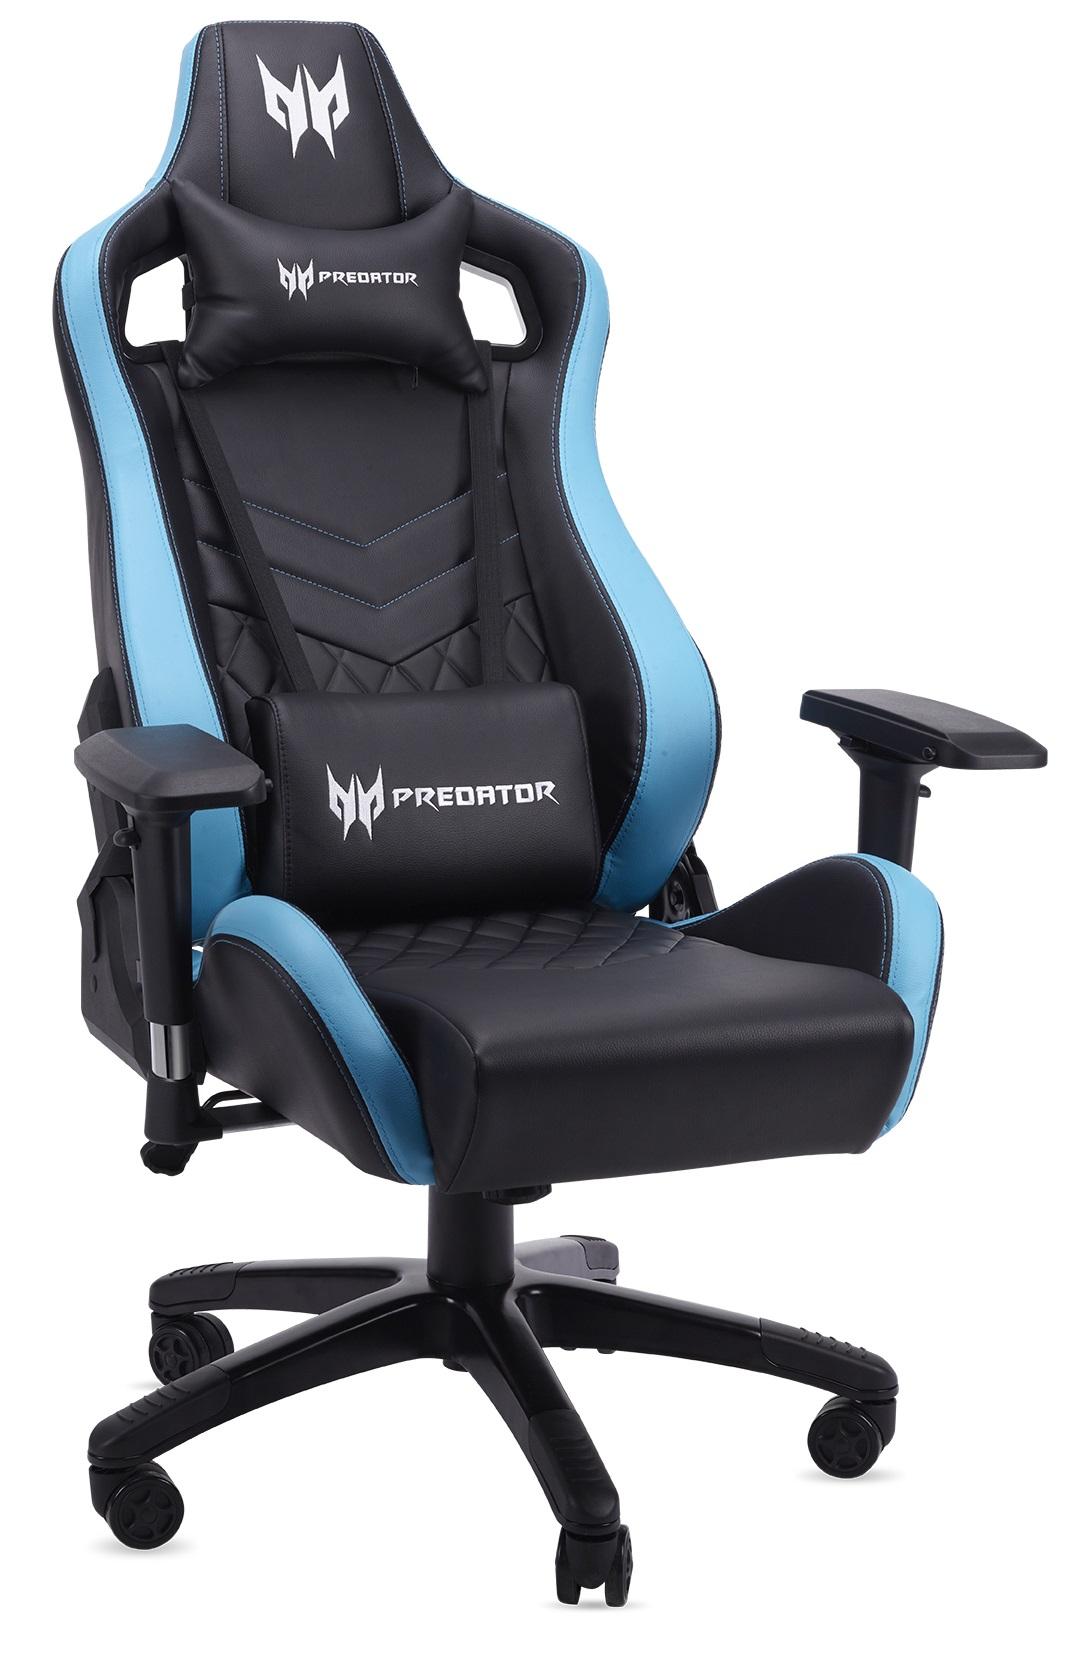 Acer Predator Gaming PGC810 fekete kék forgószék